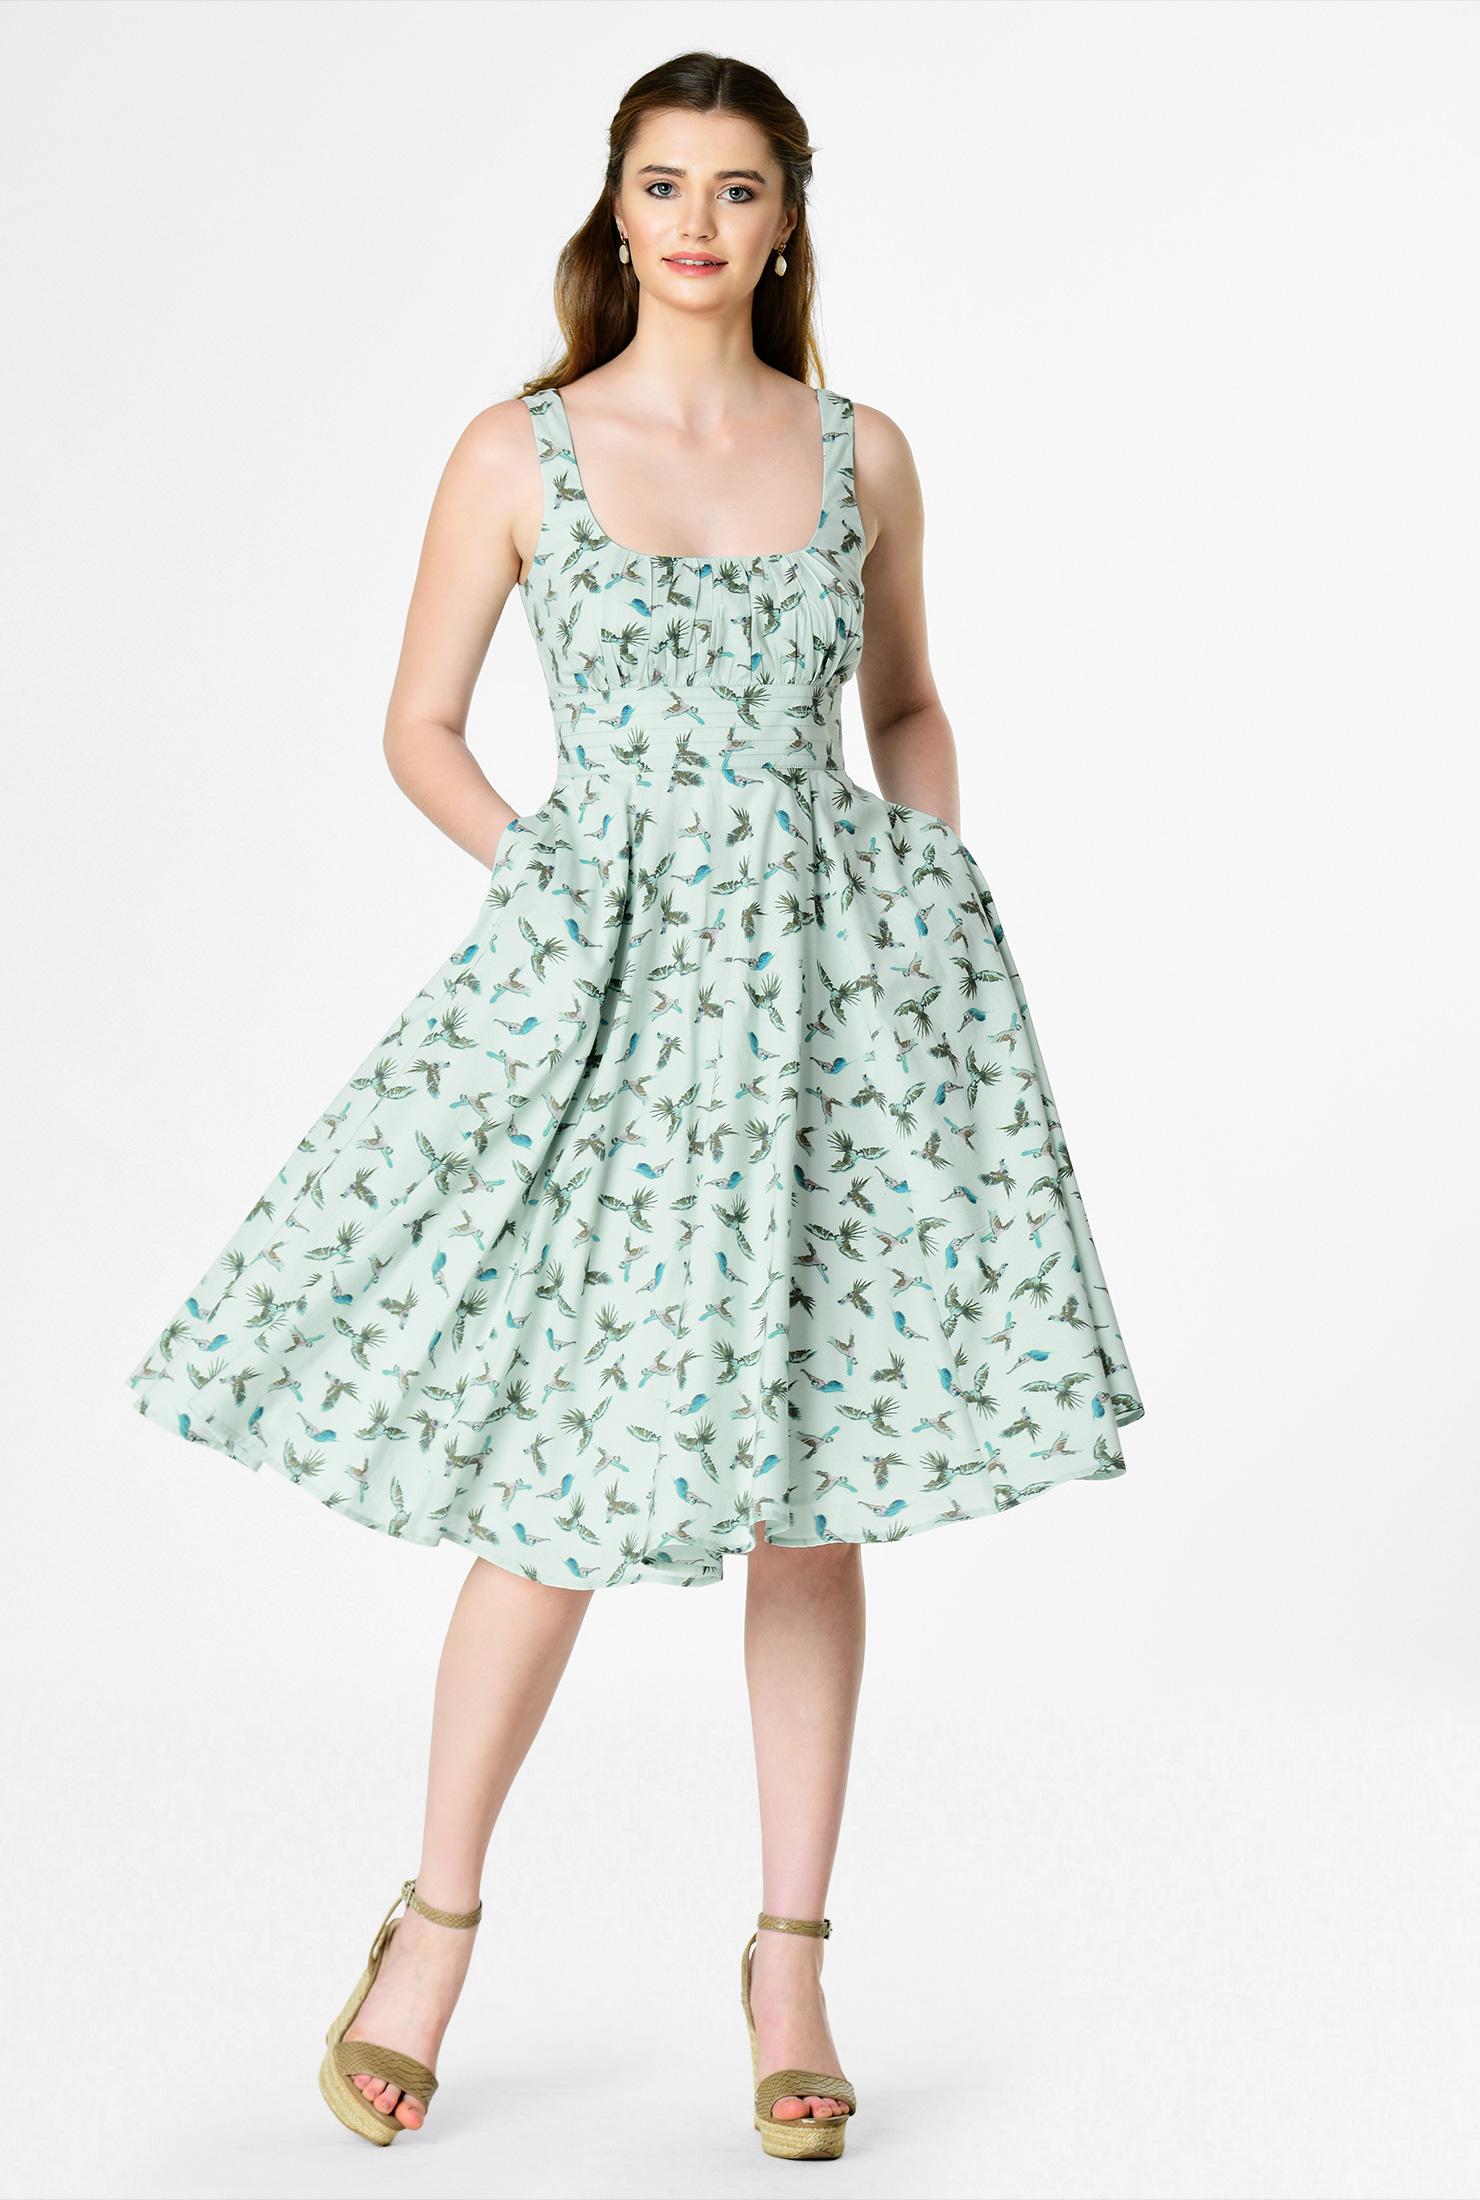 dc9760beca Women s Fashion Clothing 0-36W and Custom